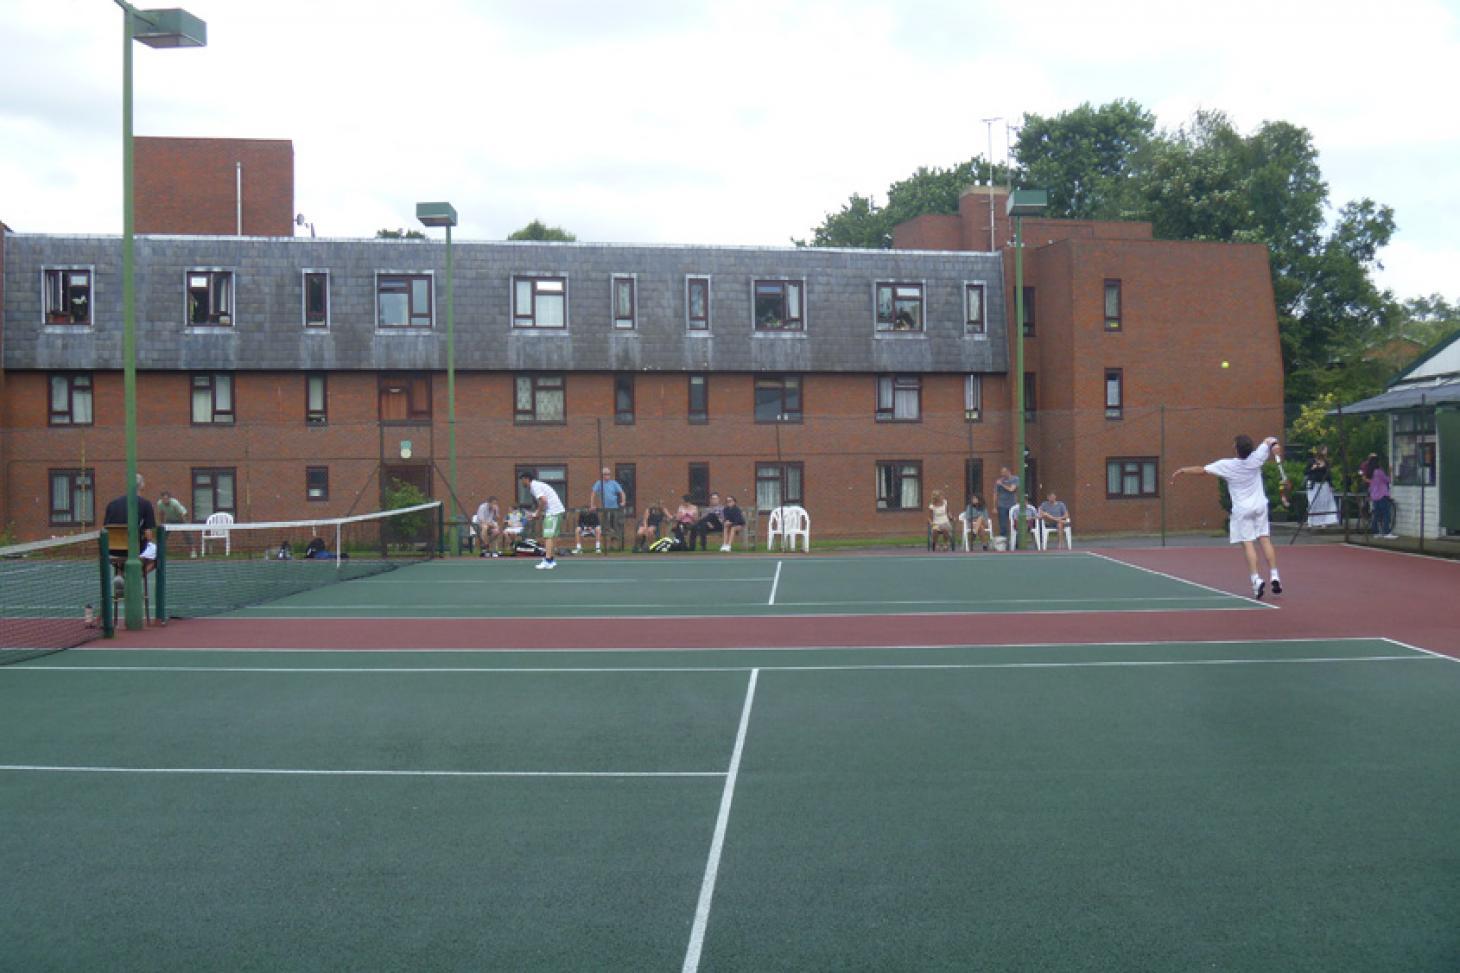 Stormont Lawn Tennis & Squash Racquets Club Outdoor | Hard (macadam) tennis court